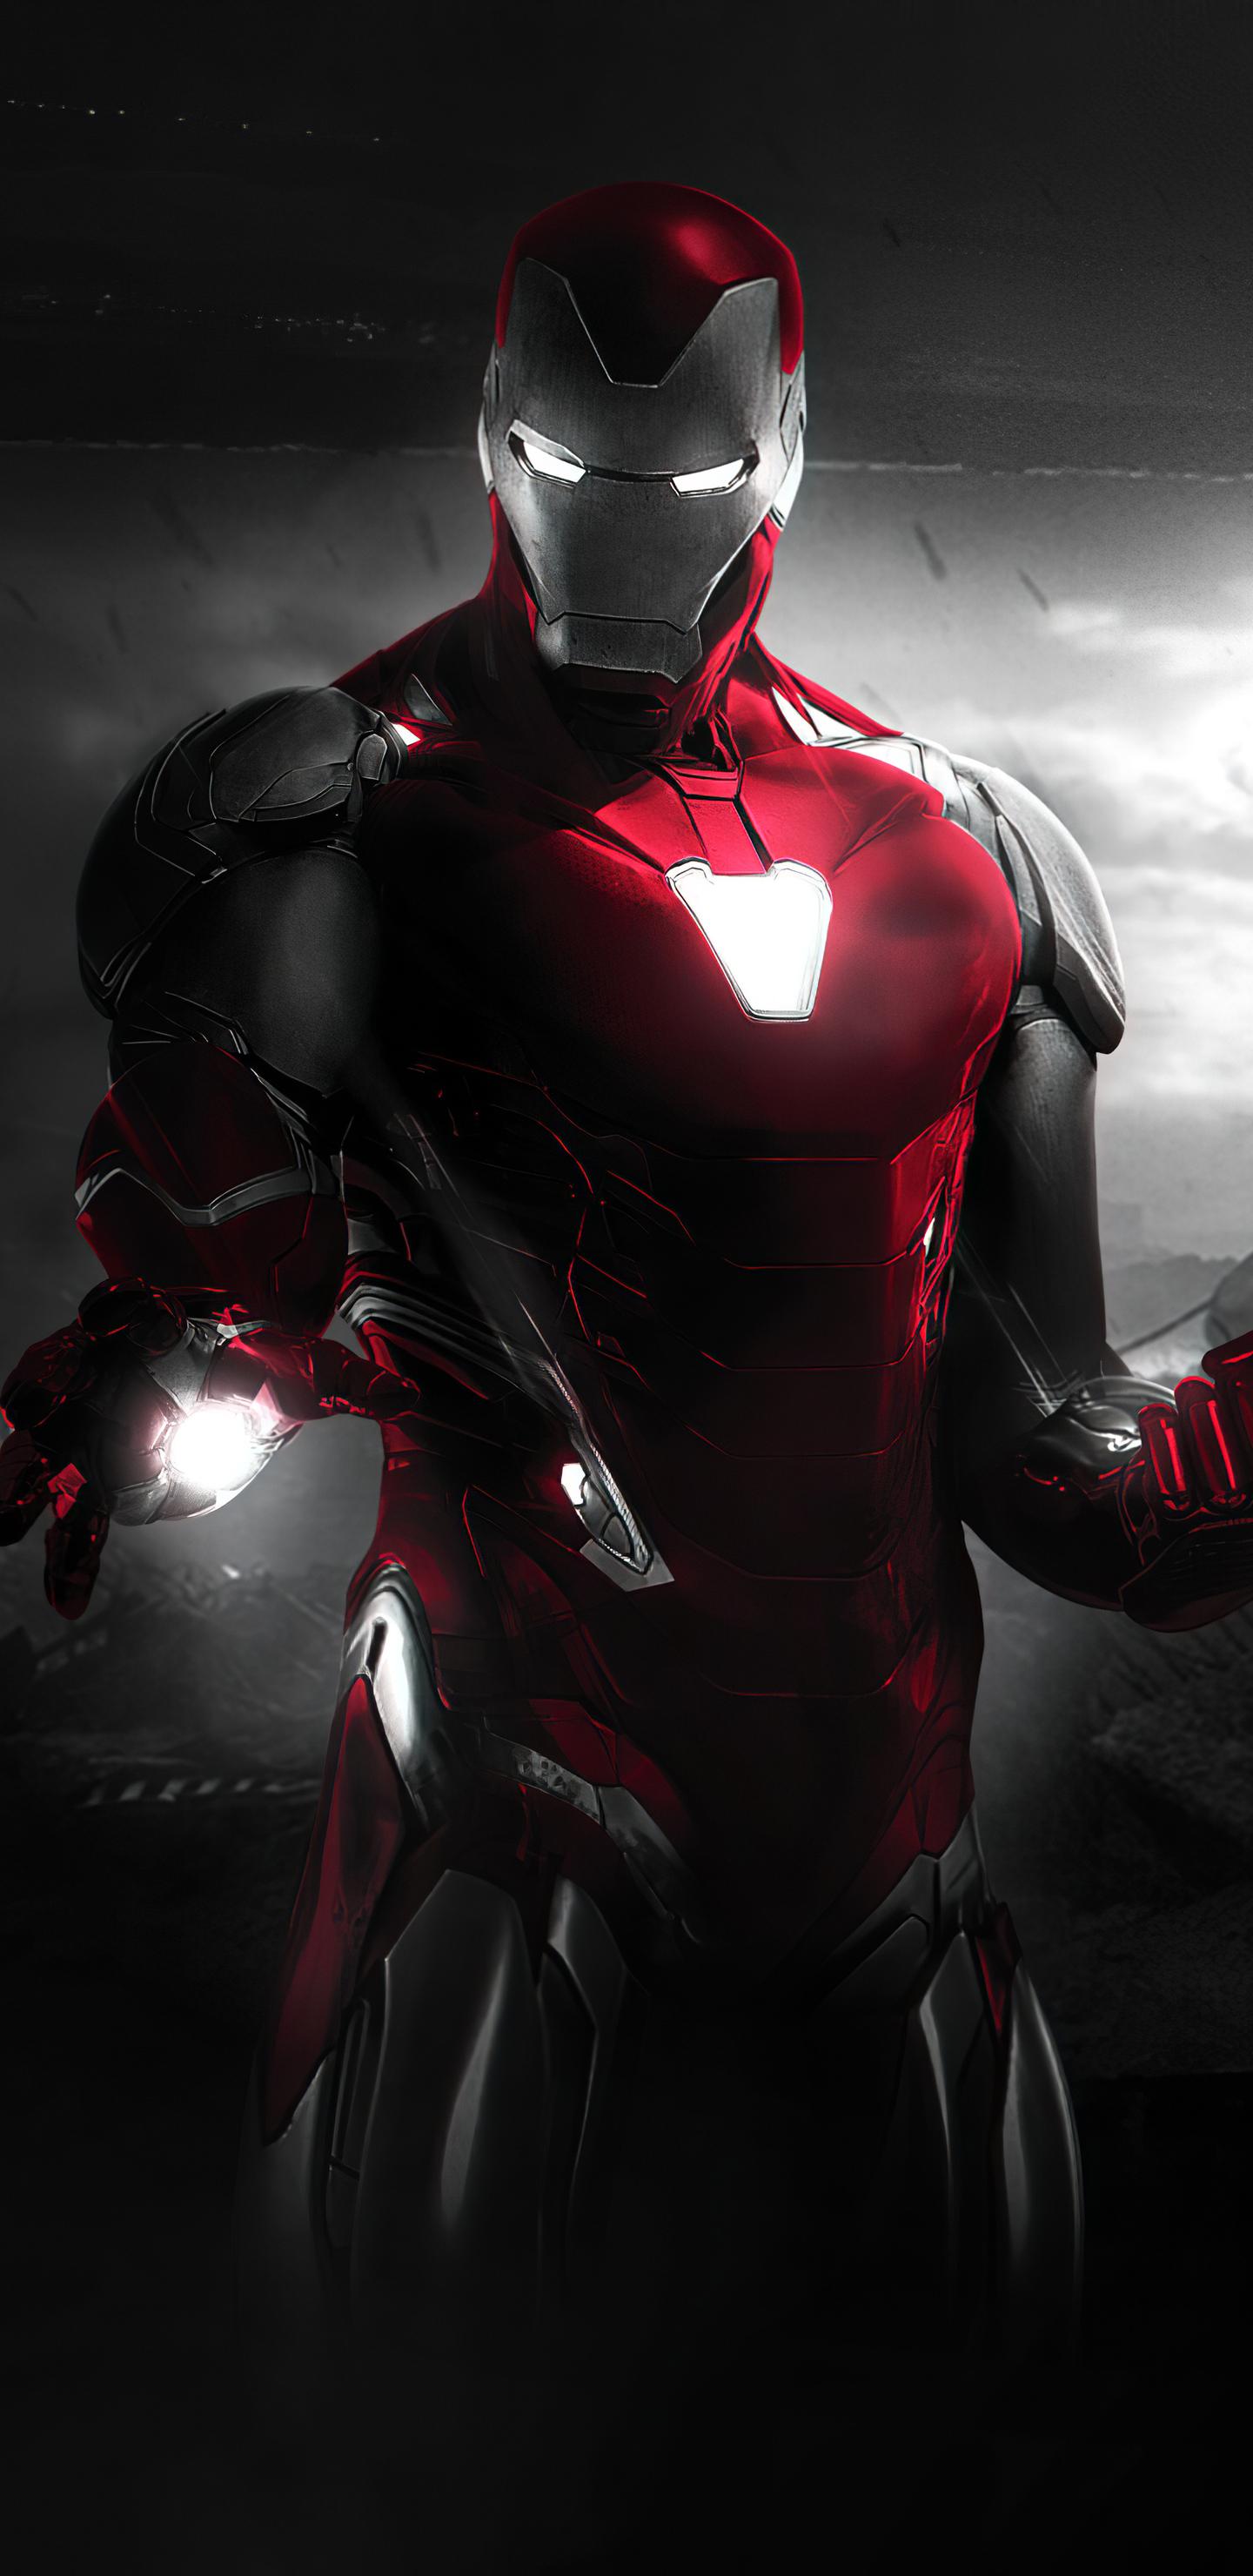 iron-man-one-year-2020-iv.jpg